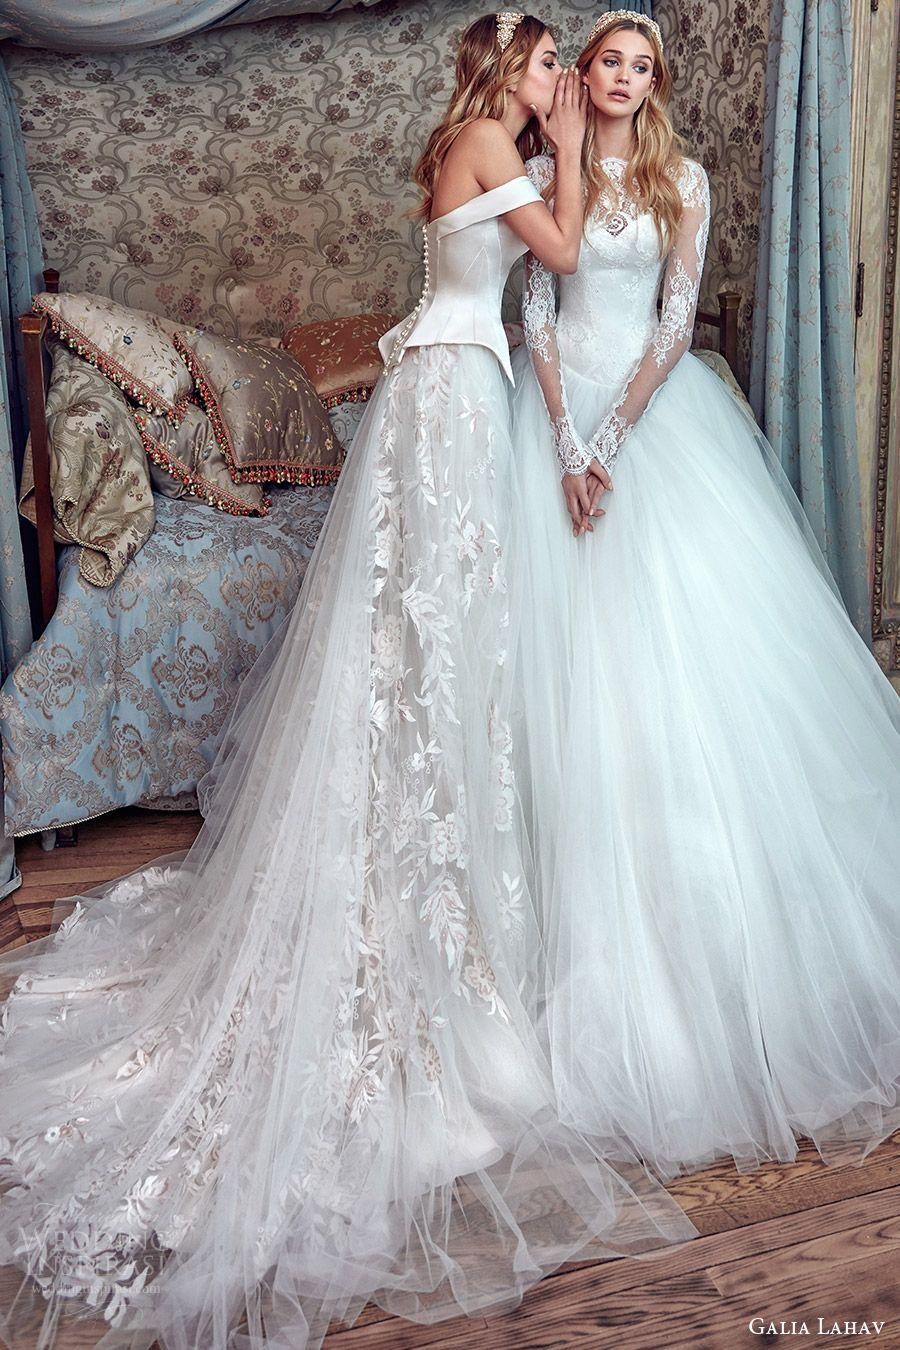 Galia Lahav Spring 2017 Couture Wedding Dresses Le Secret Royal - Galia Lahav Wedding Dresses